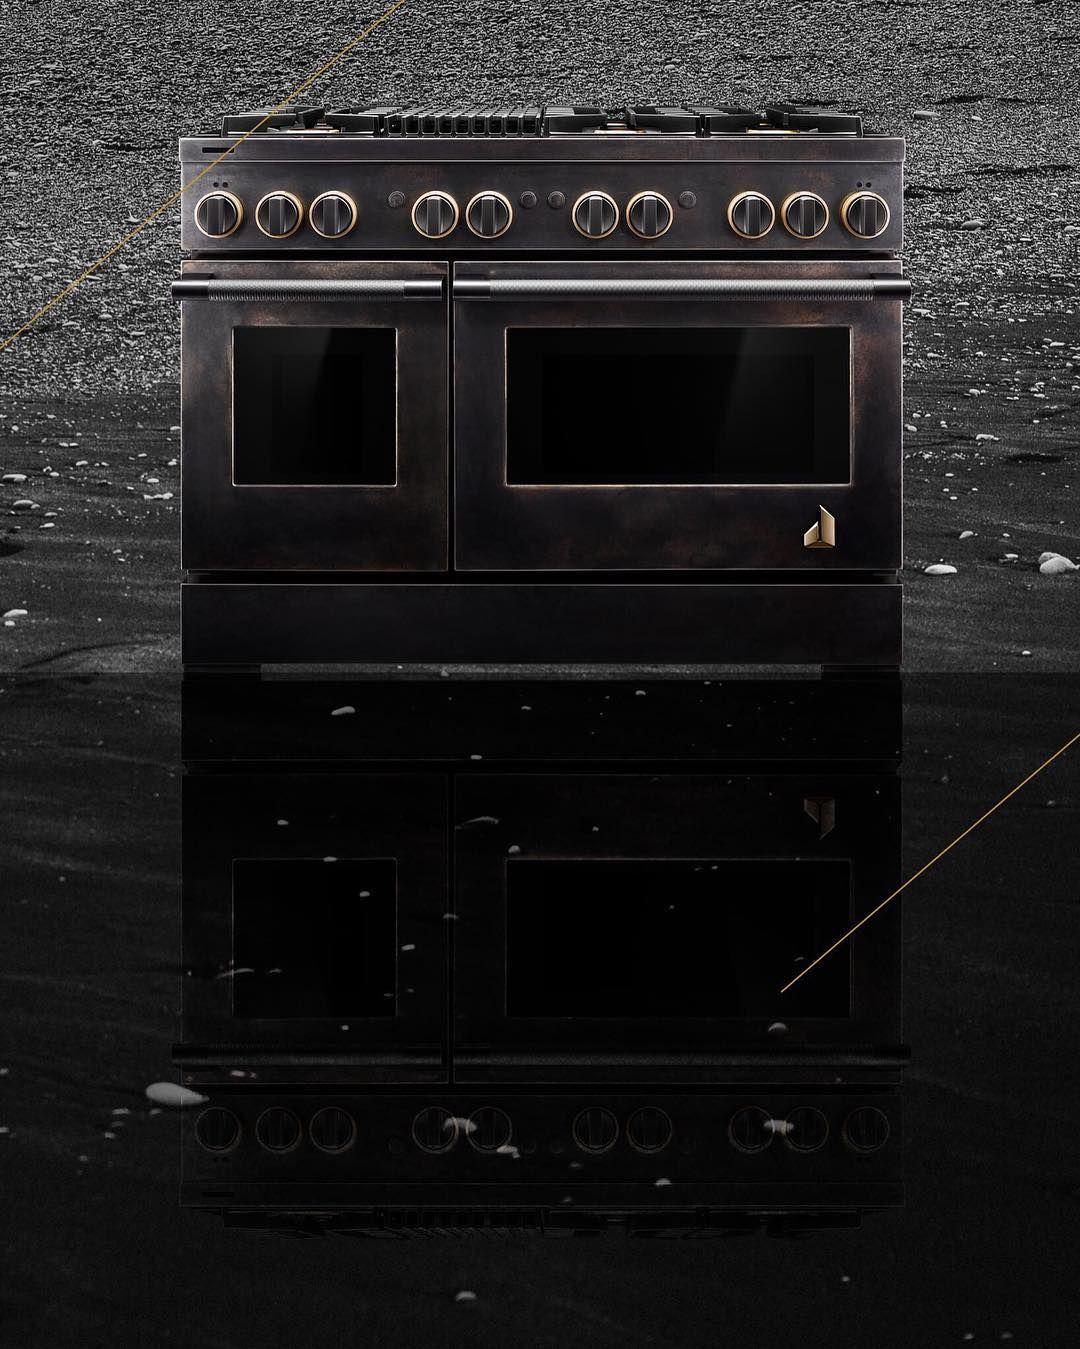 Pin by plesserus appliances on jennair in pinterest range